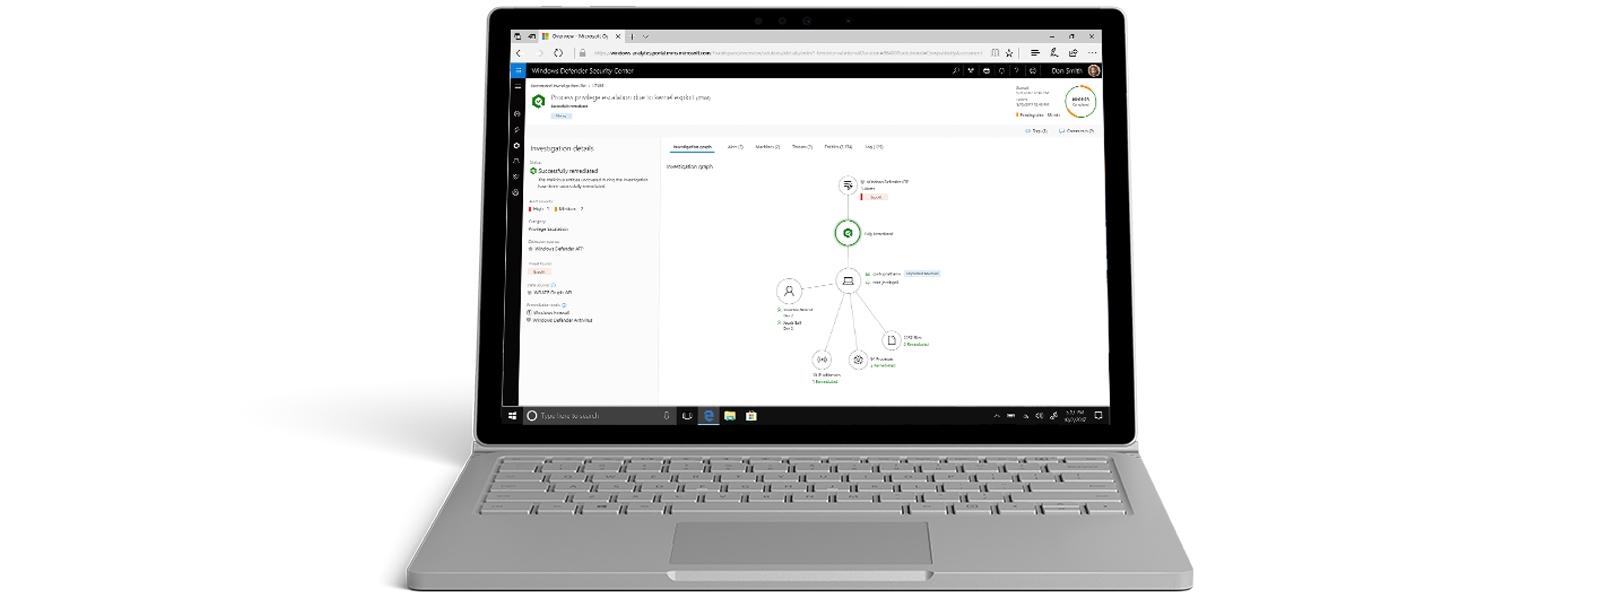 Surface Laptop con Windows Defender Center en la pantalla